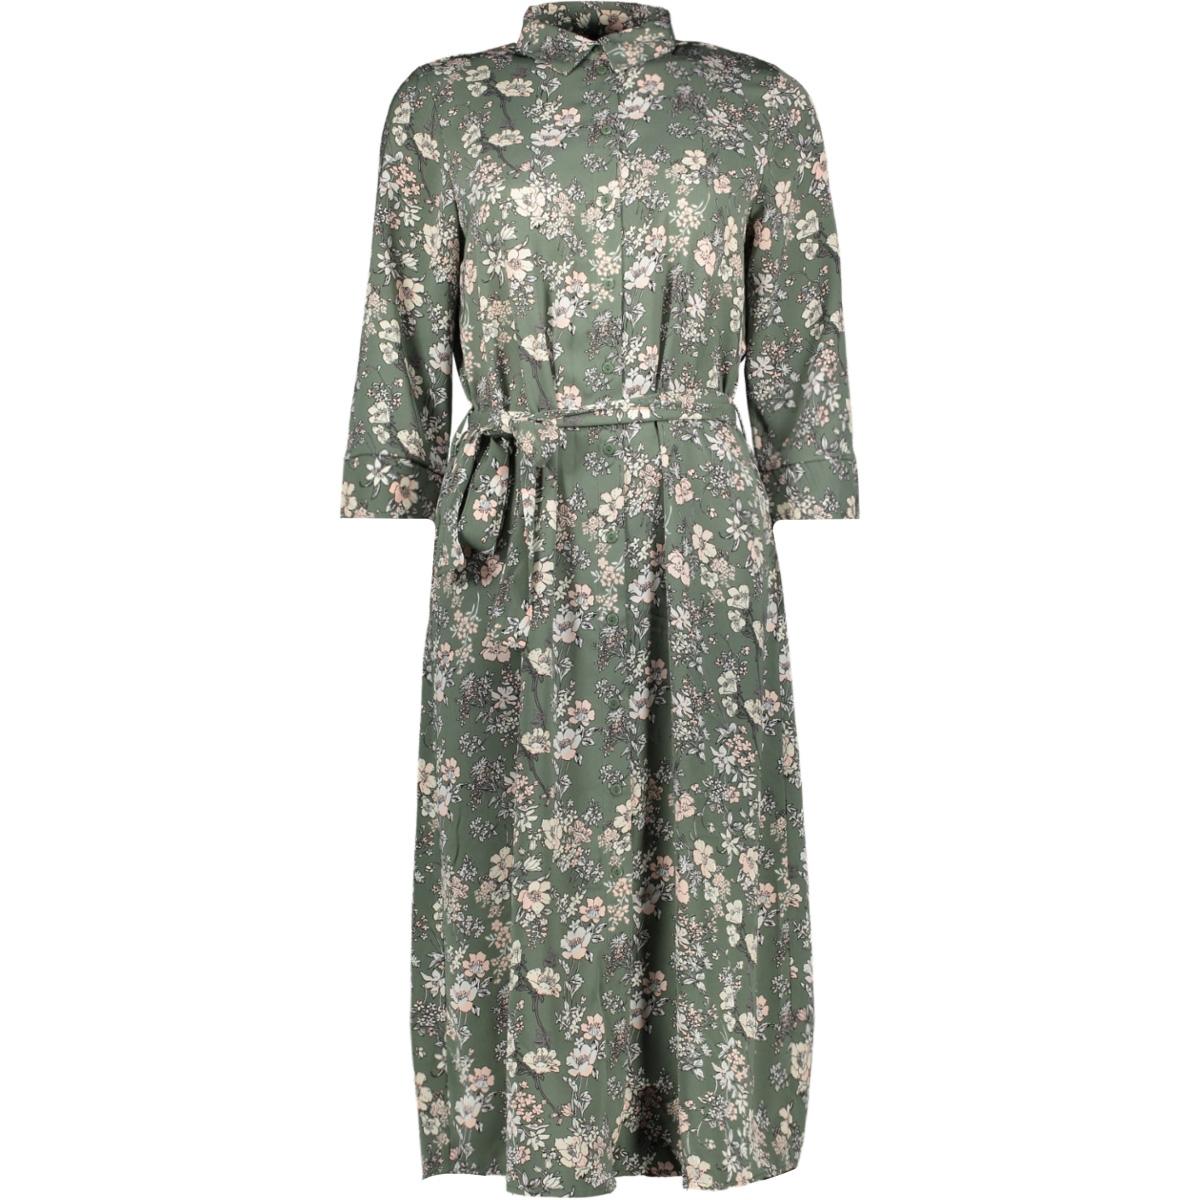 vmdiana 3/4 calf shirt dress wvn da 10227859 vero moda jurk laurel wreath/diana